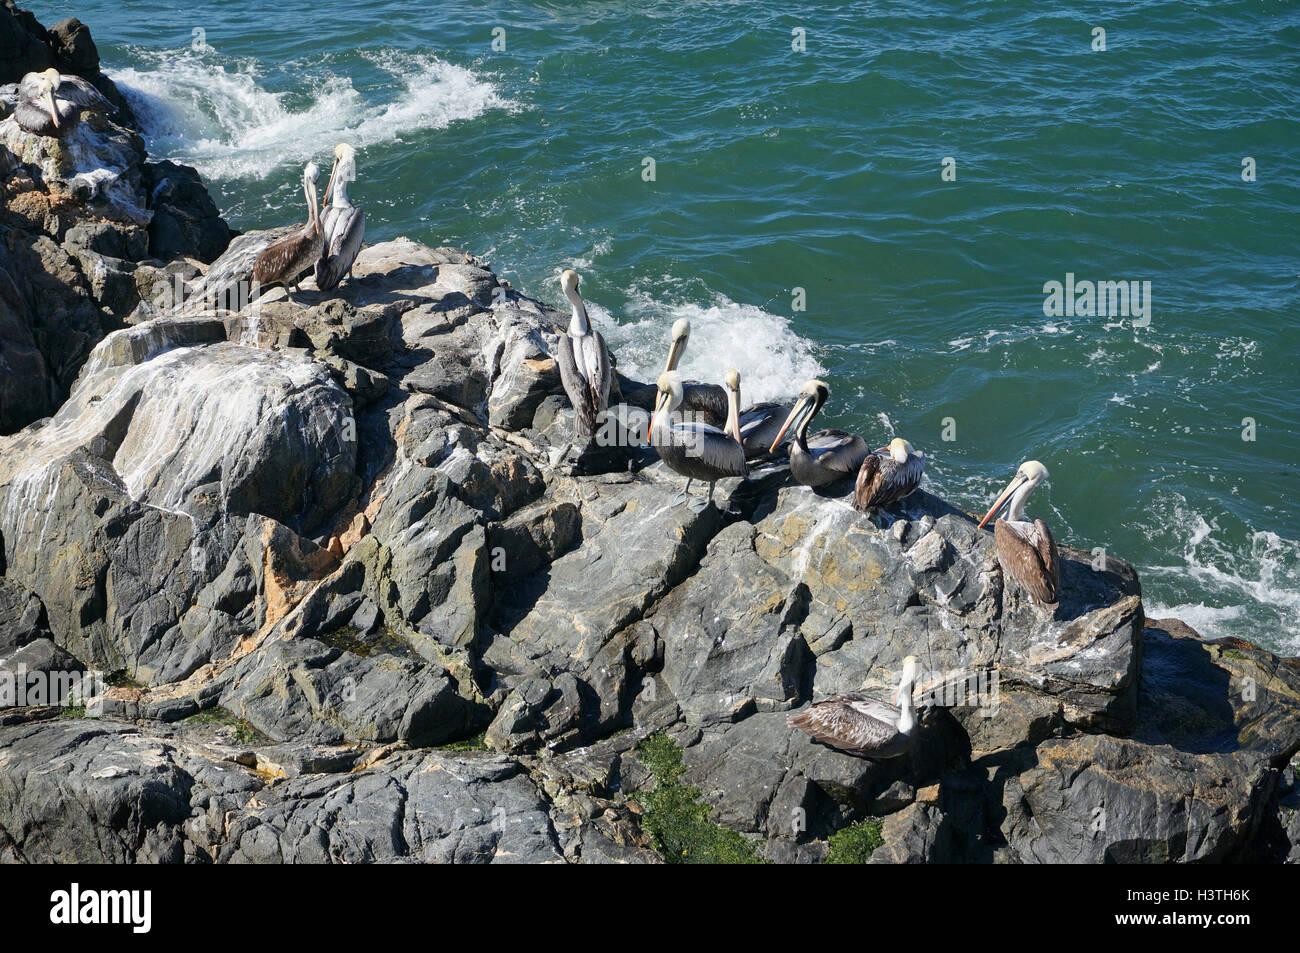 Pelicans, Vina del Mar, Chile - Stock Image